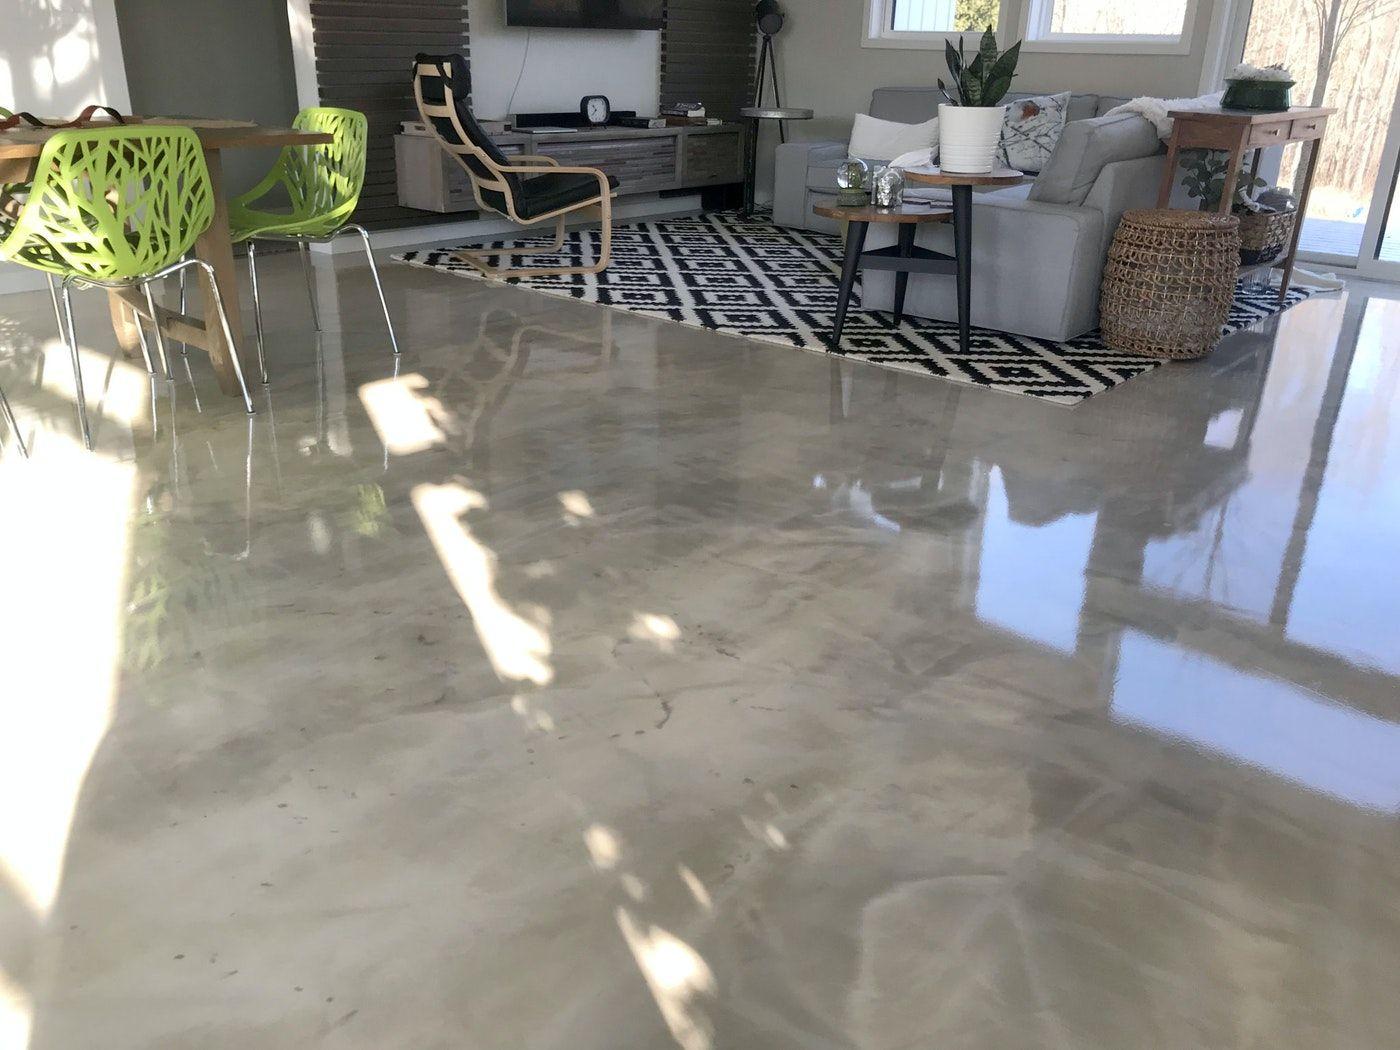 DIY Metallic Epoxy Flooring over gypsum underlayment for